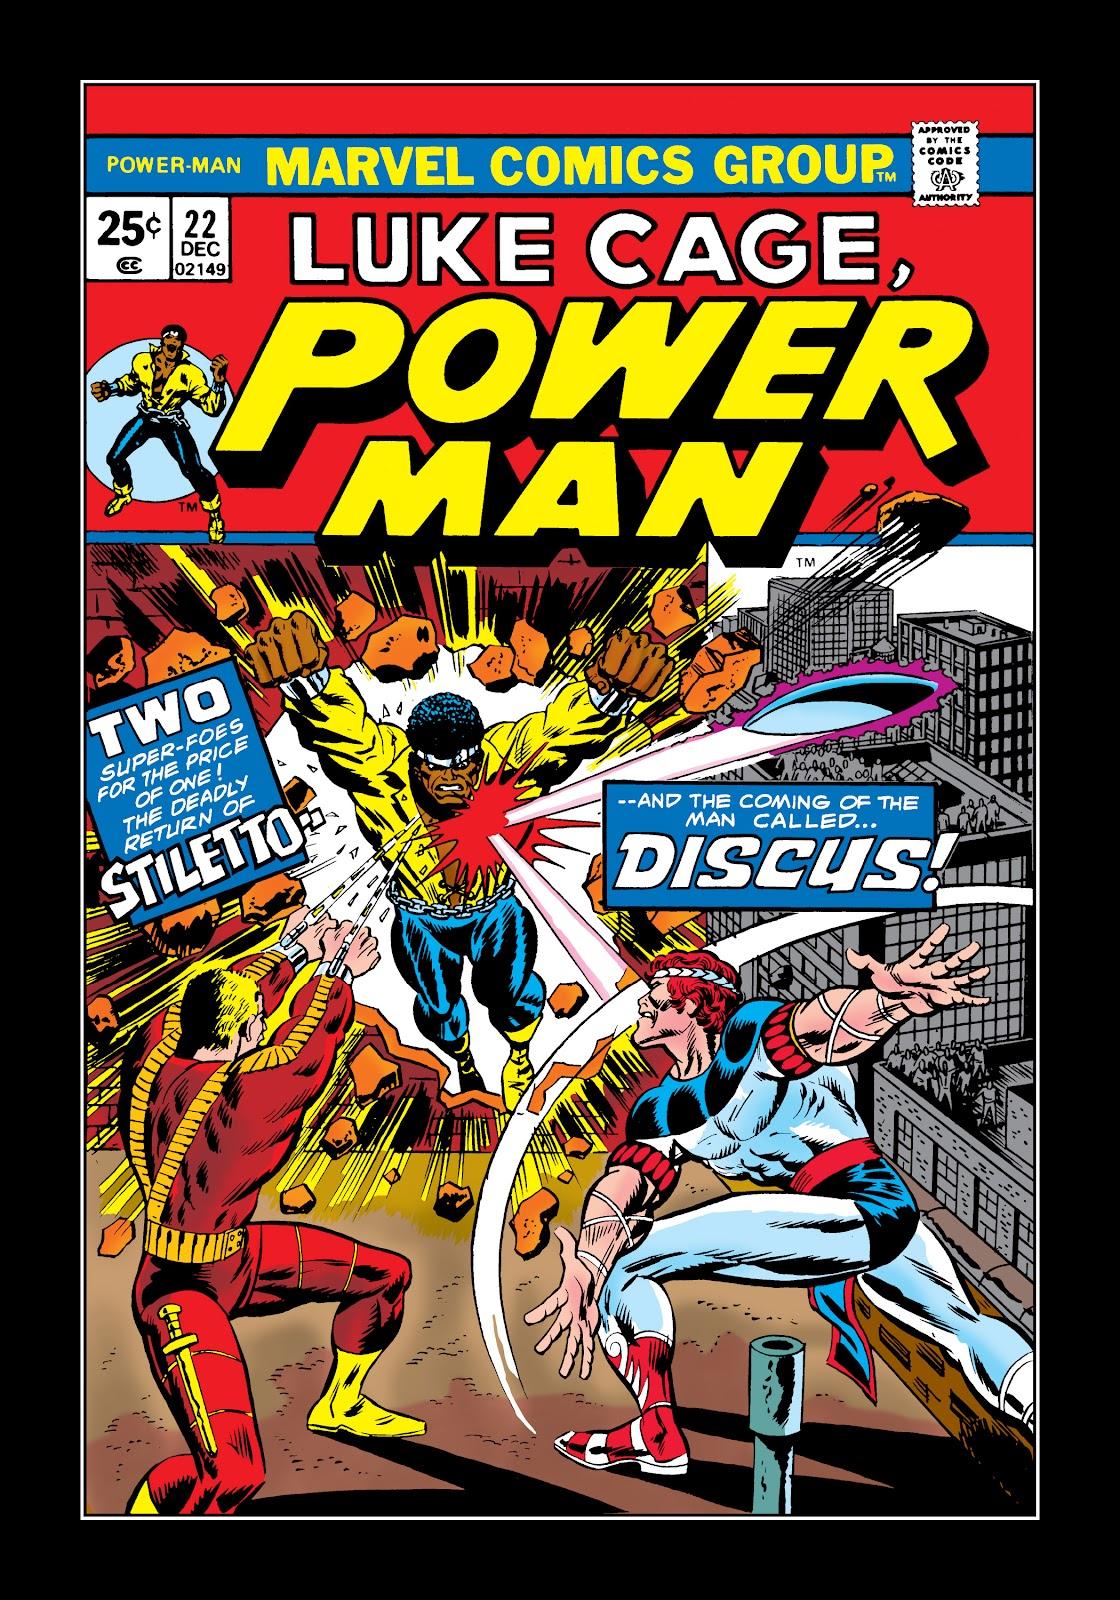 Read online Marvel Masterworks: Luke Cage, Power Man comic -  Issue # TPB 2 (Part 2) - 6